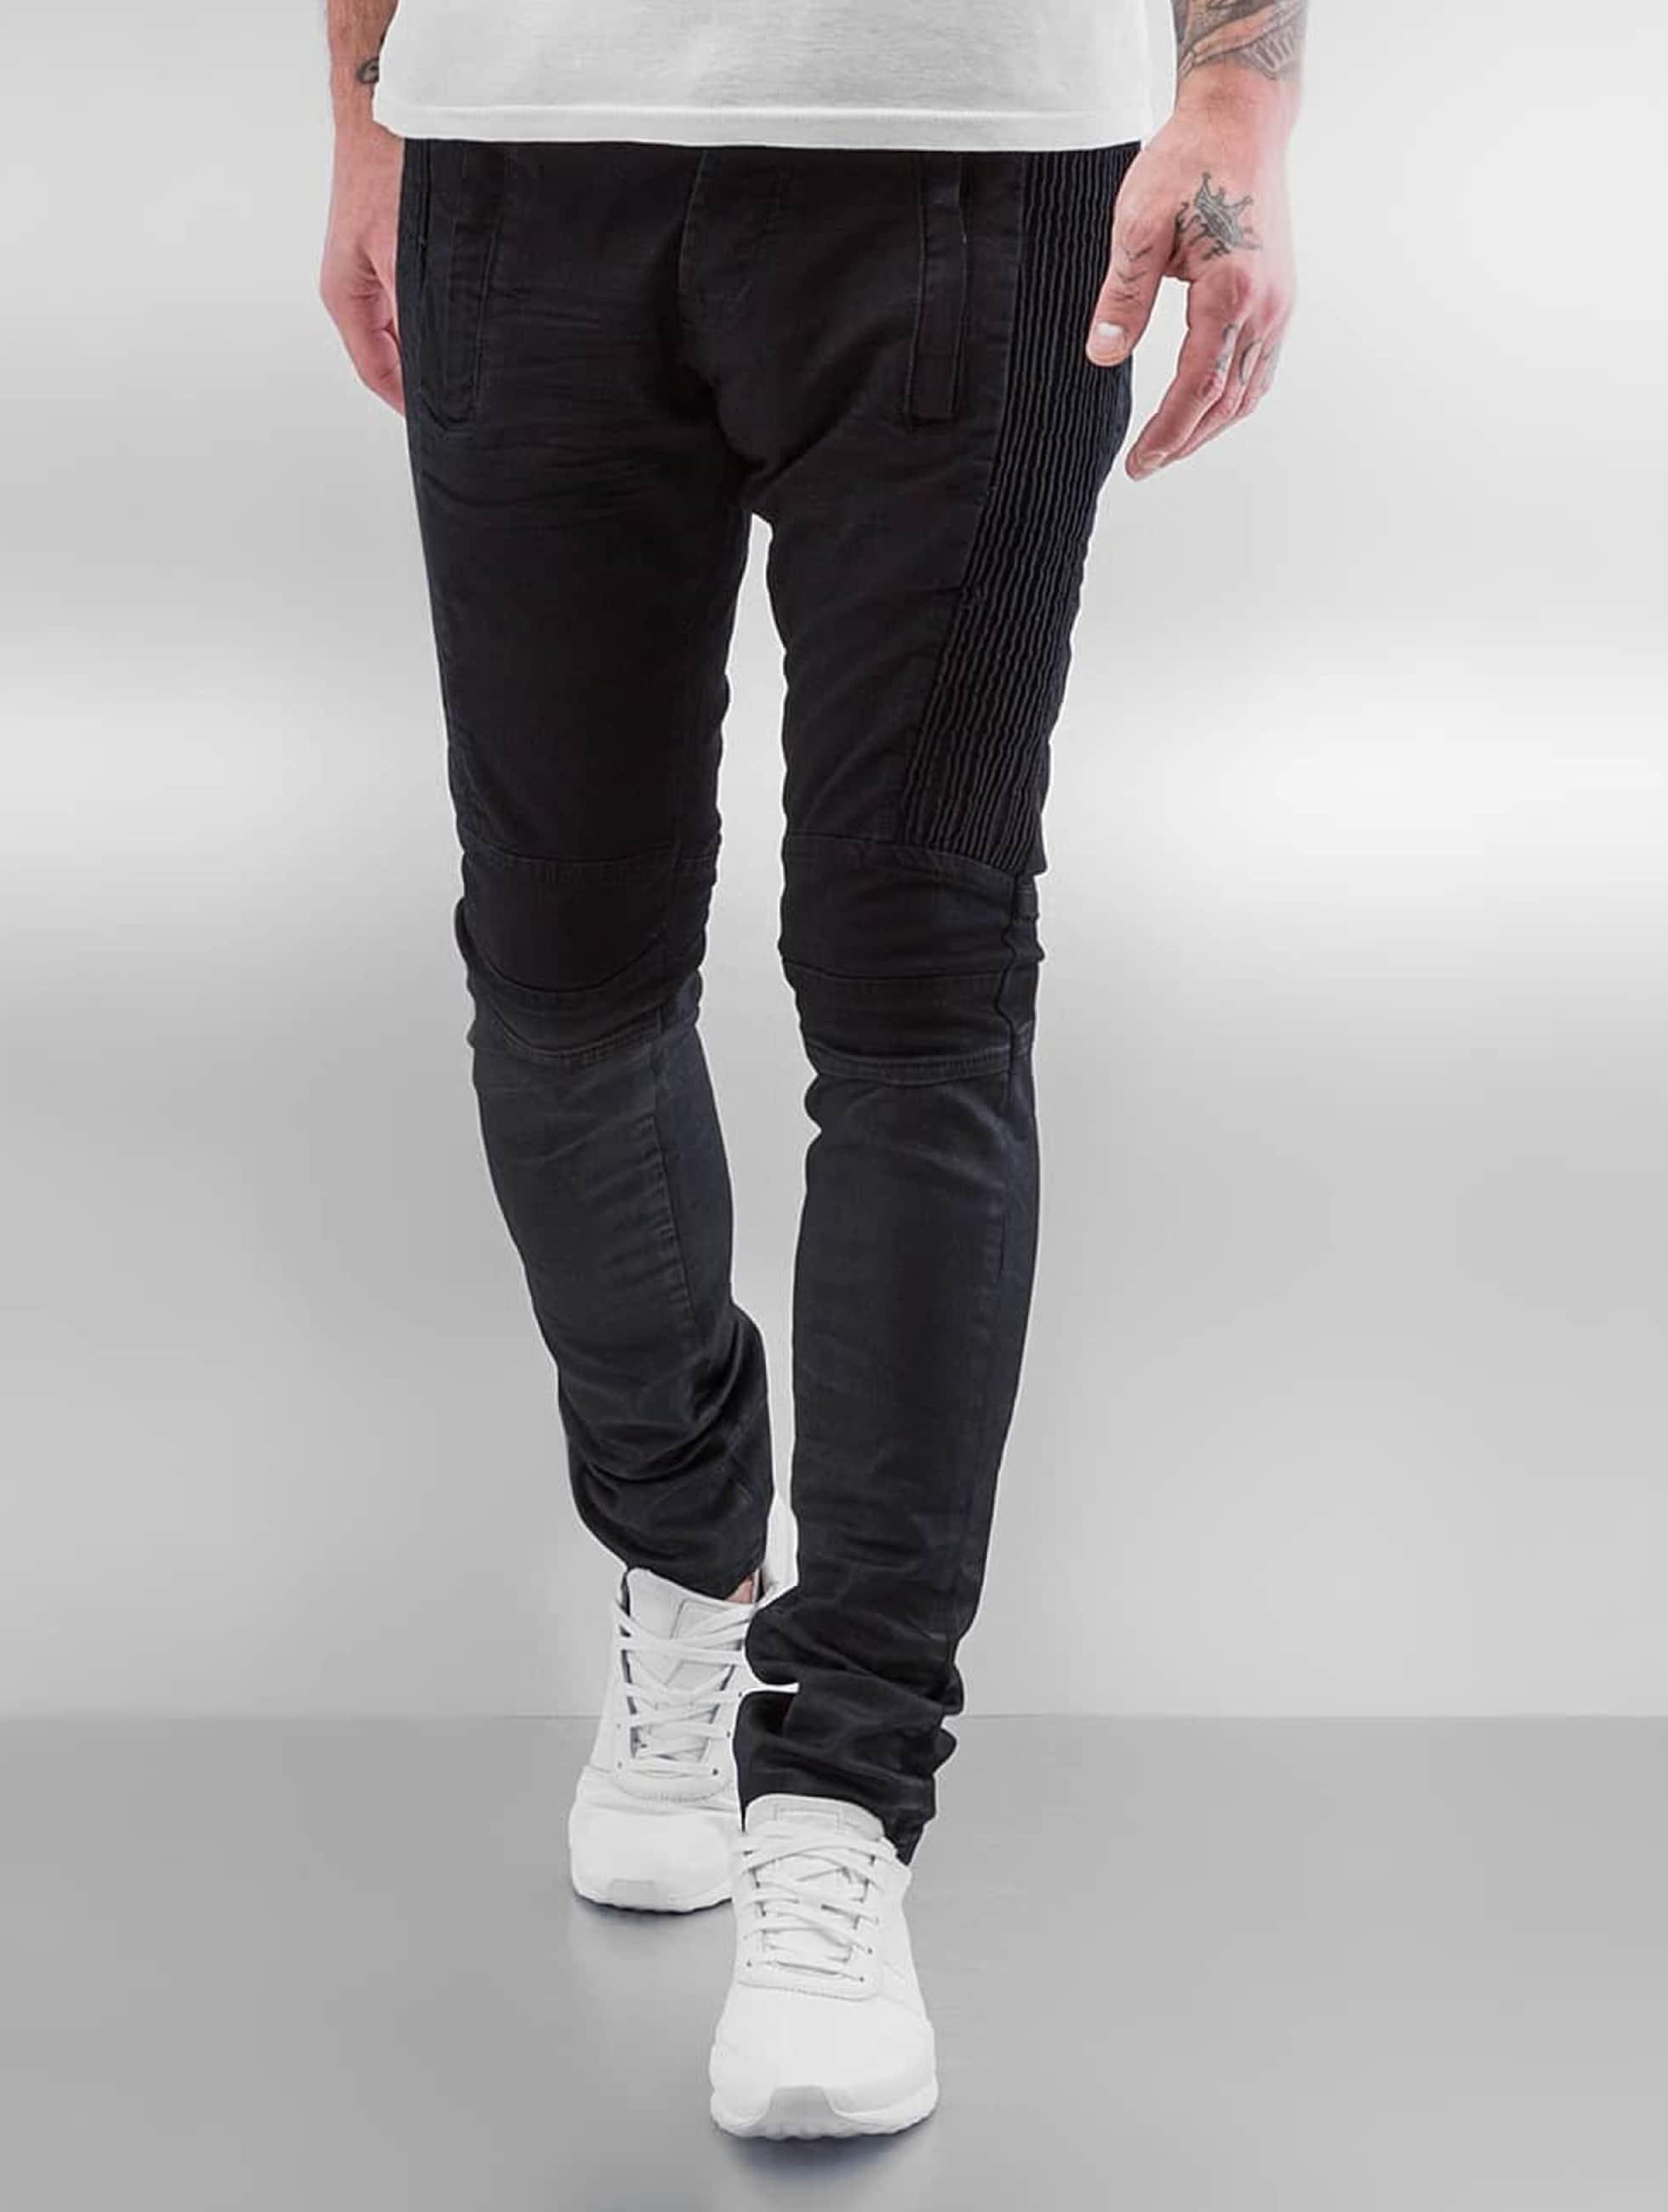 2Y / Skinny Jeans Vlora in black W 34